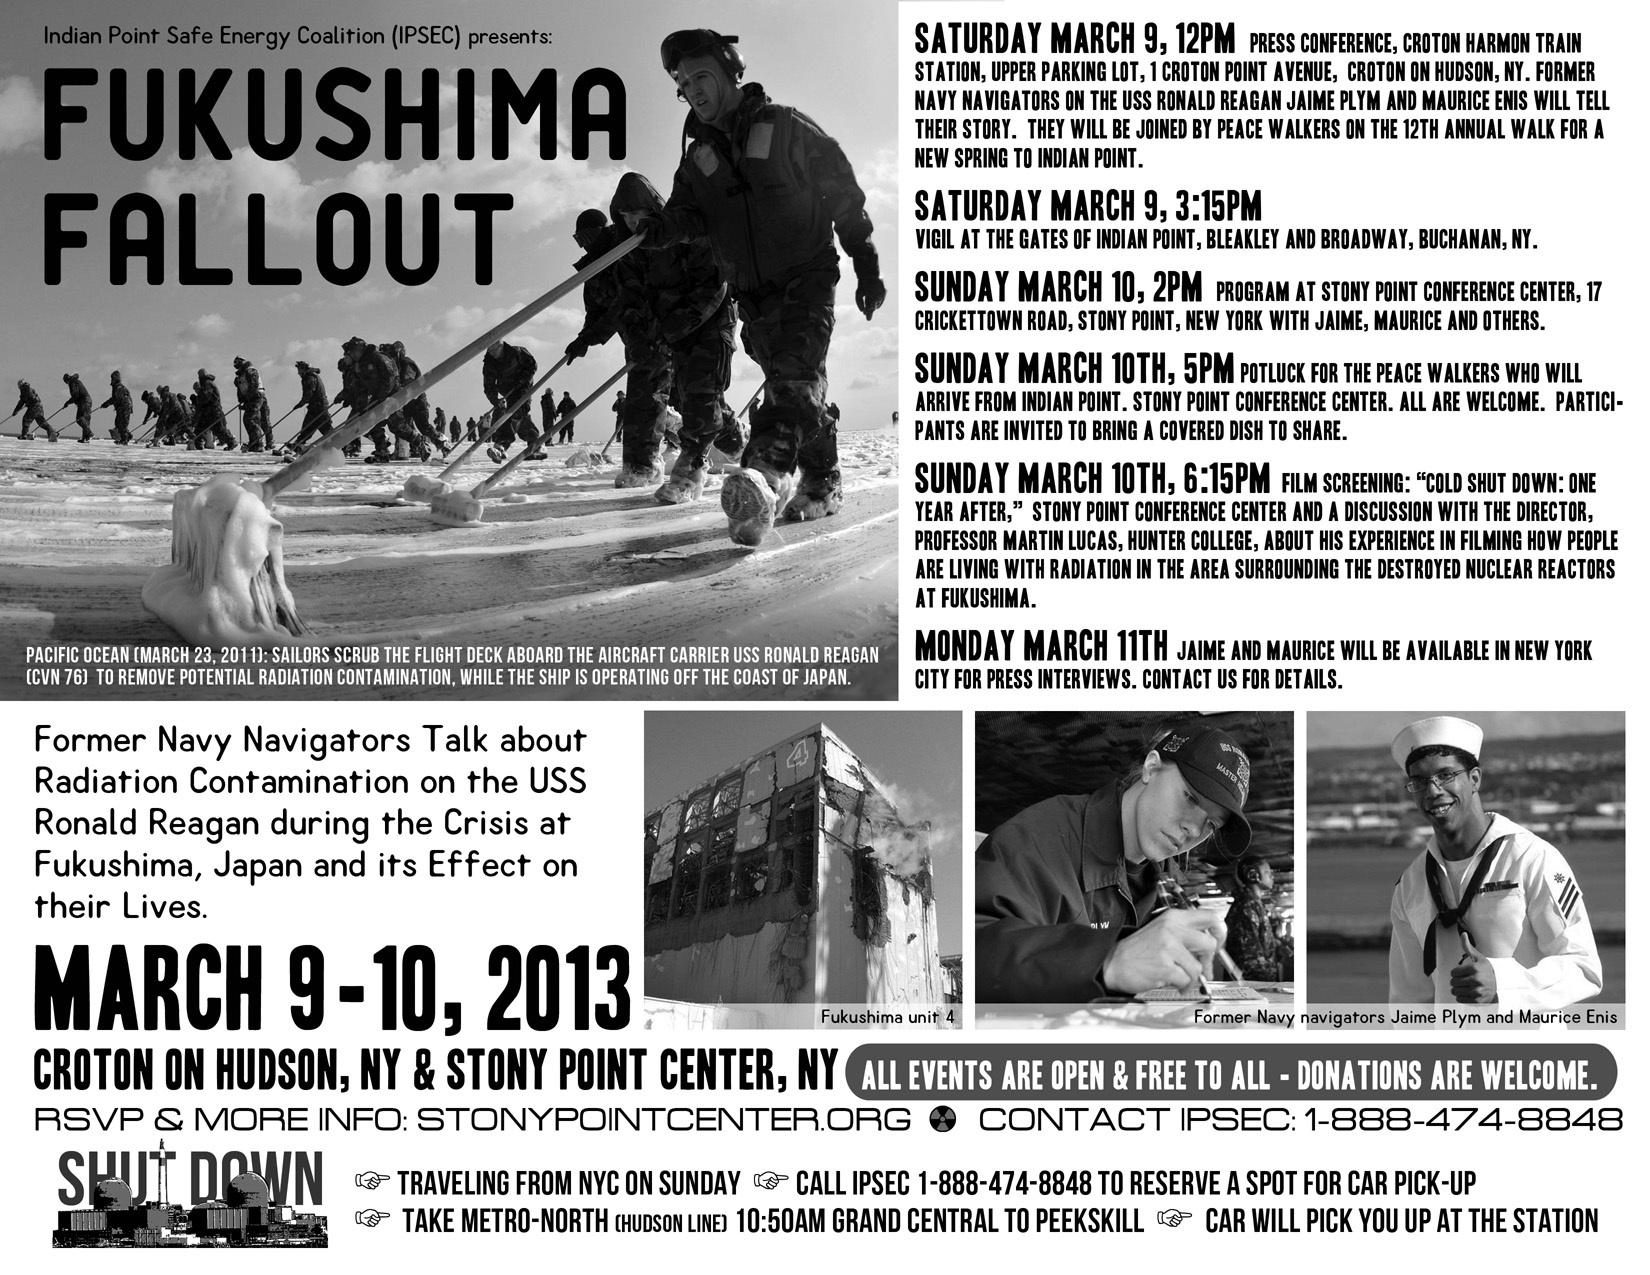 Fukushima Fallout flyer